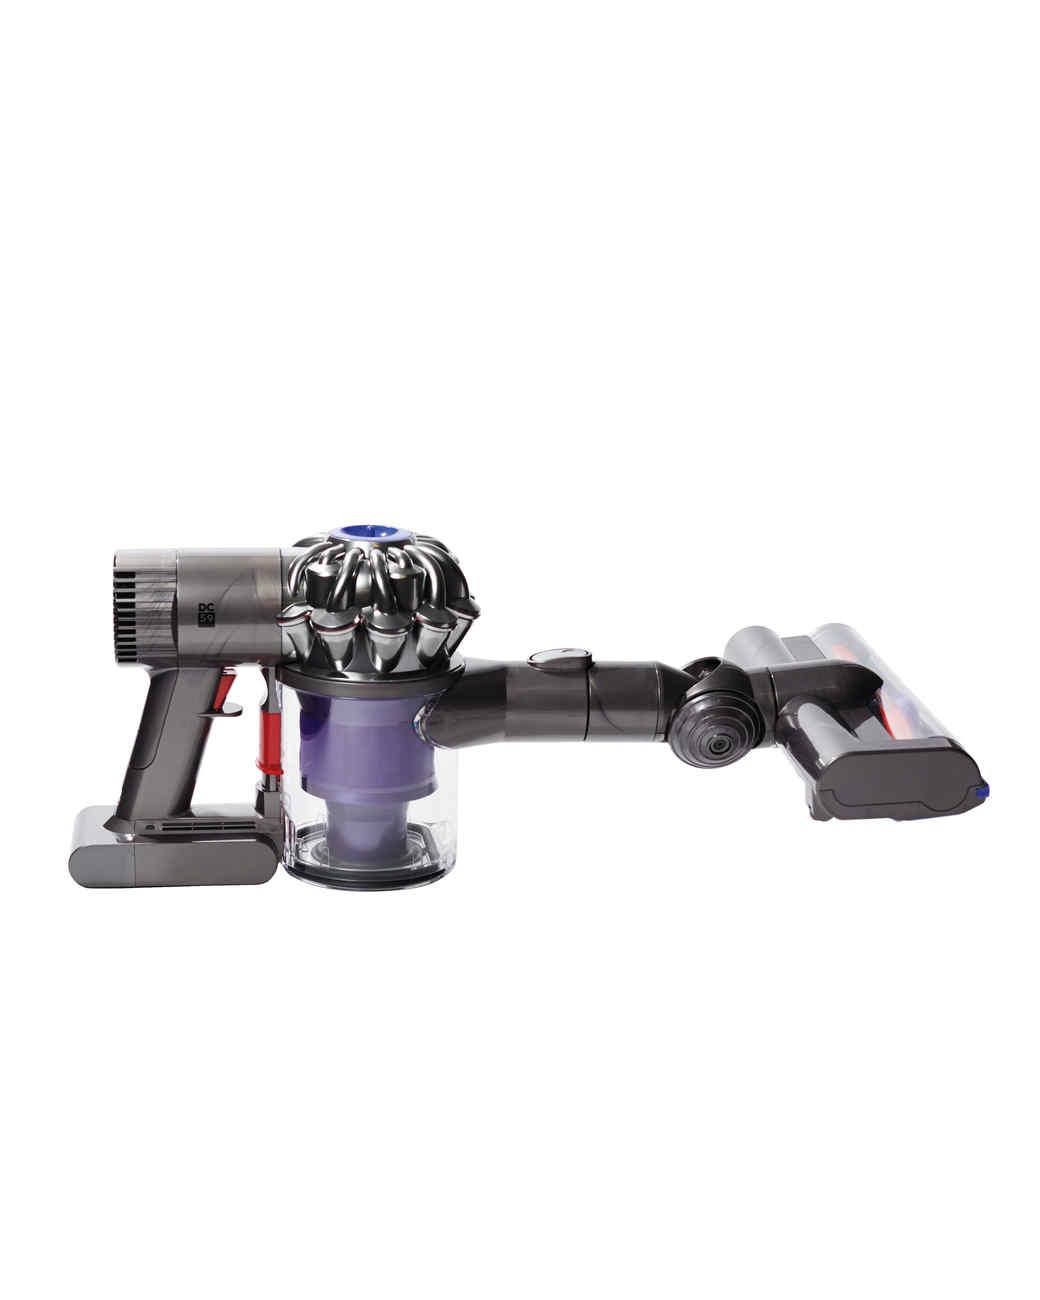 dyson-hand-held-vacuum-mld110972.jpg